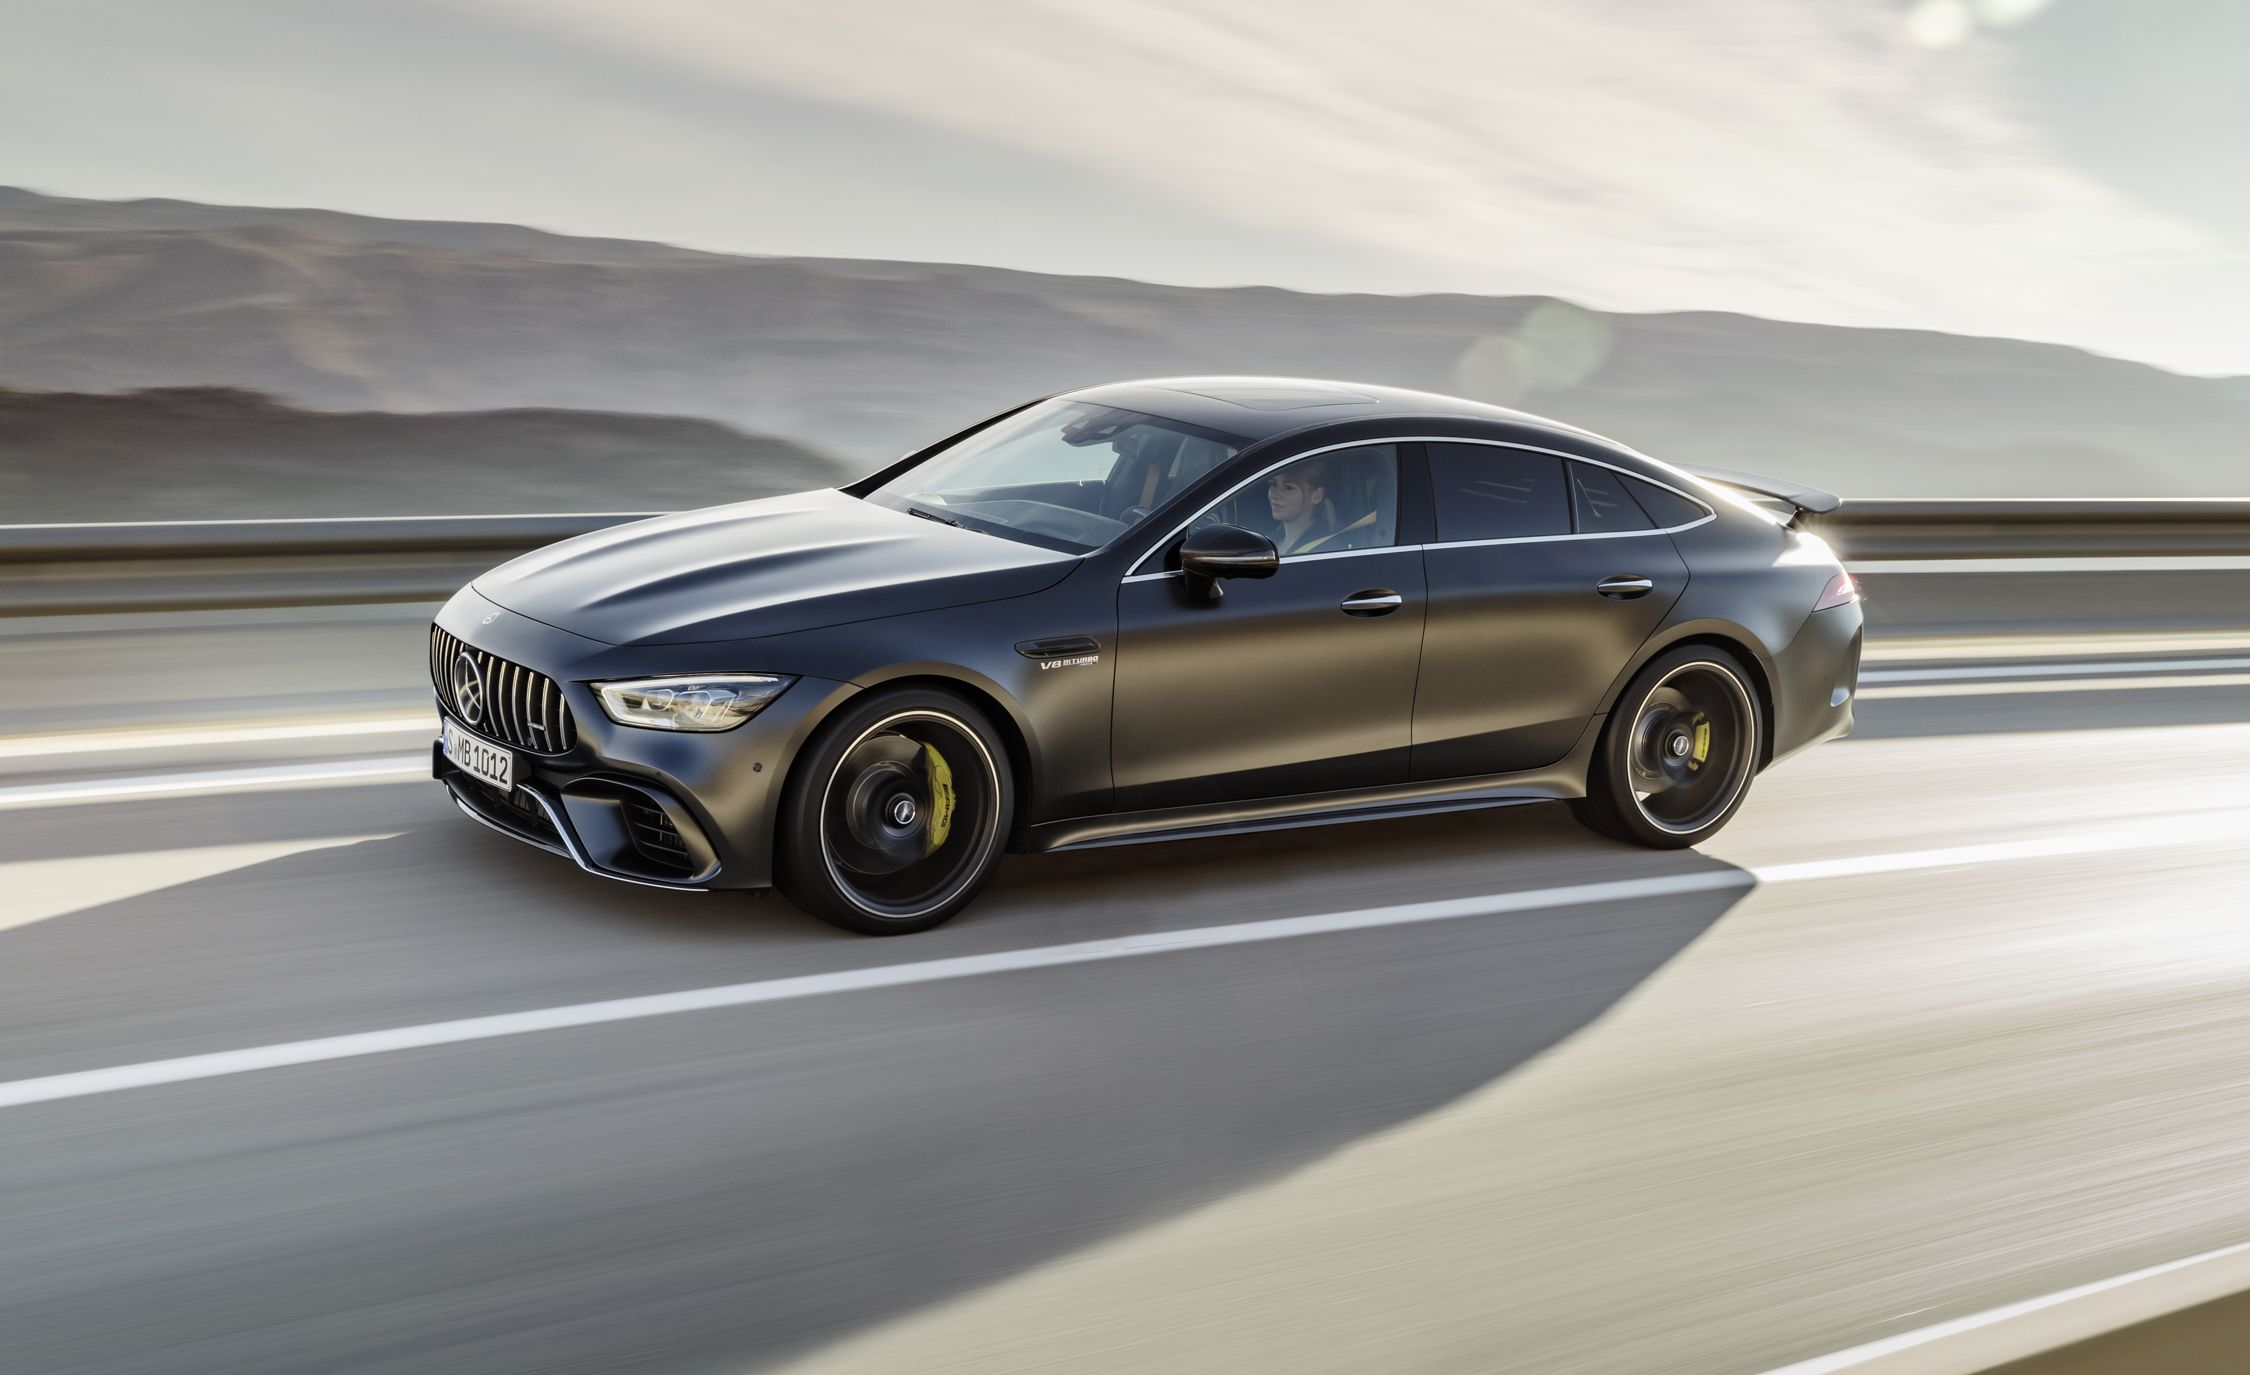 2019 Mercedes-AMG GT 4-Door The More-Door AMG & 2019 Mercedes-AMG GT 4-Door Coupe Officially Unveiled Packs up to ...